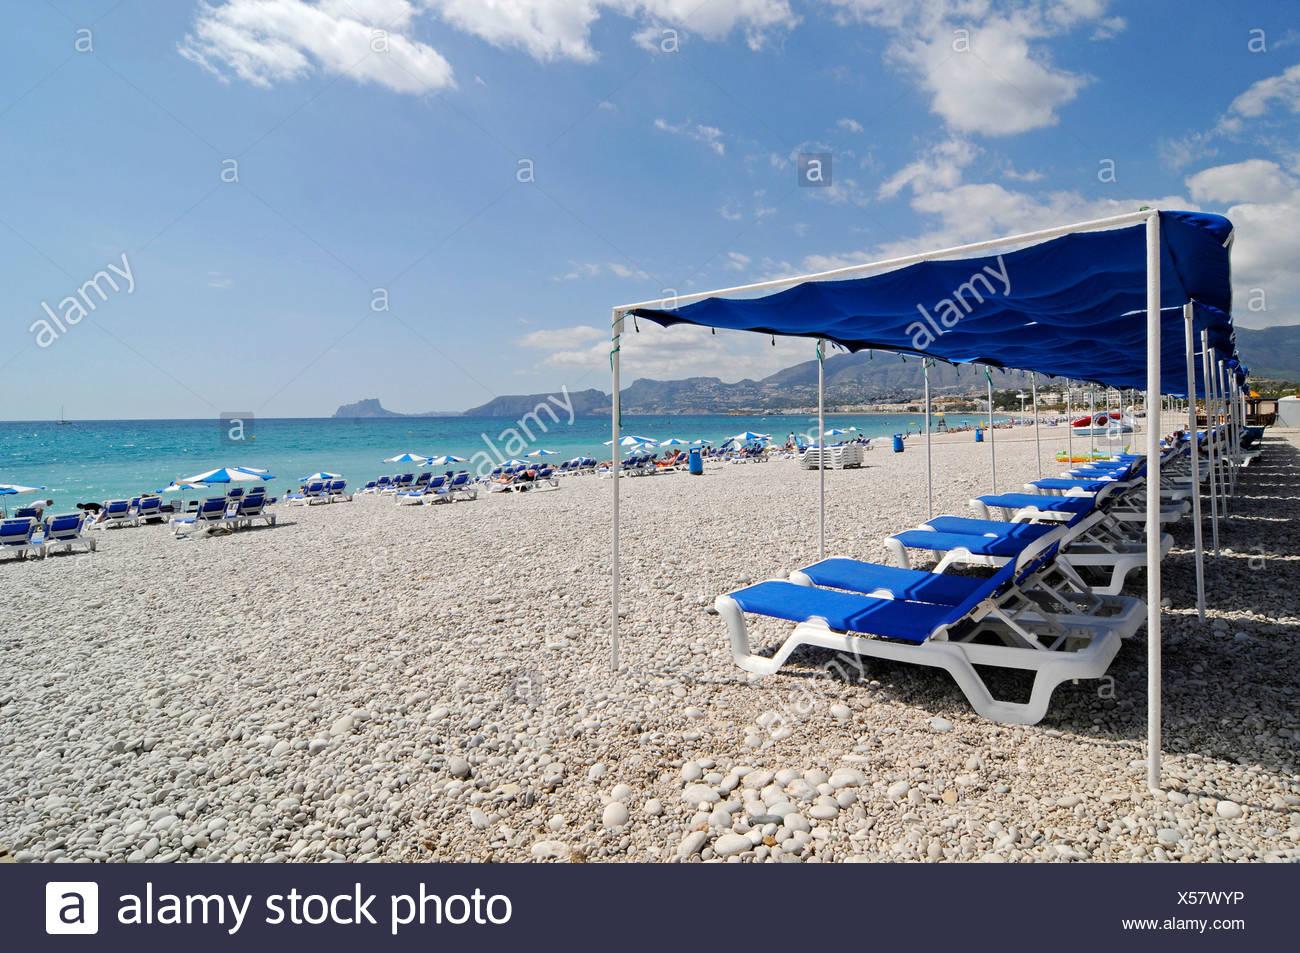 Leere blaue Stühle, Sonnenschirme, Kiesstrand, Albir, Altea, Costa Blanca, Alicante, Spanien, Europa Stockbild